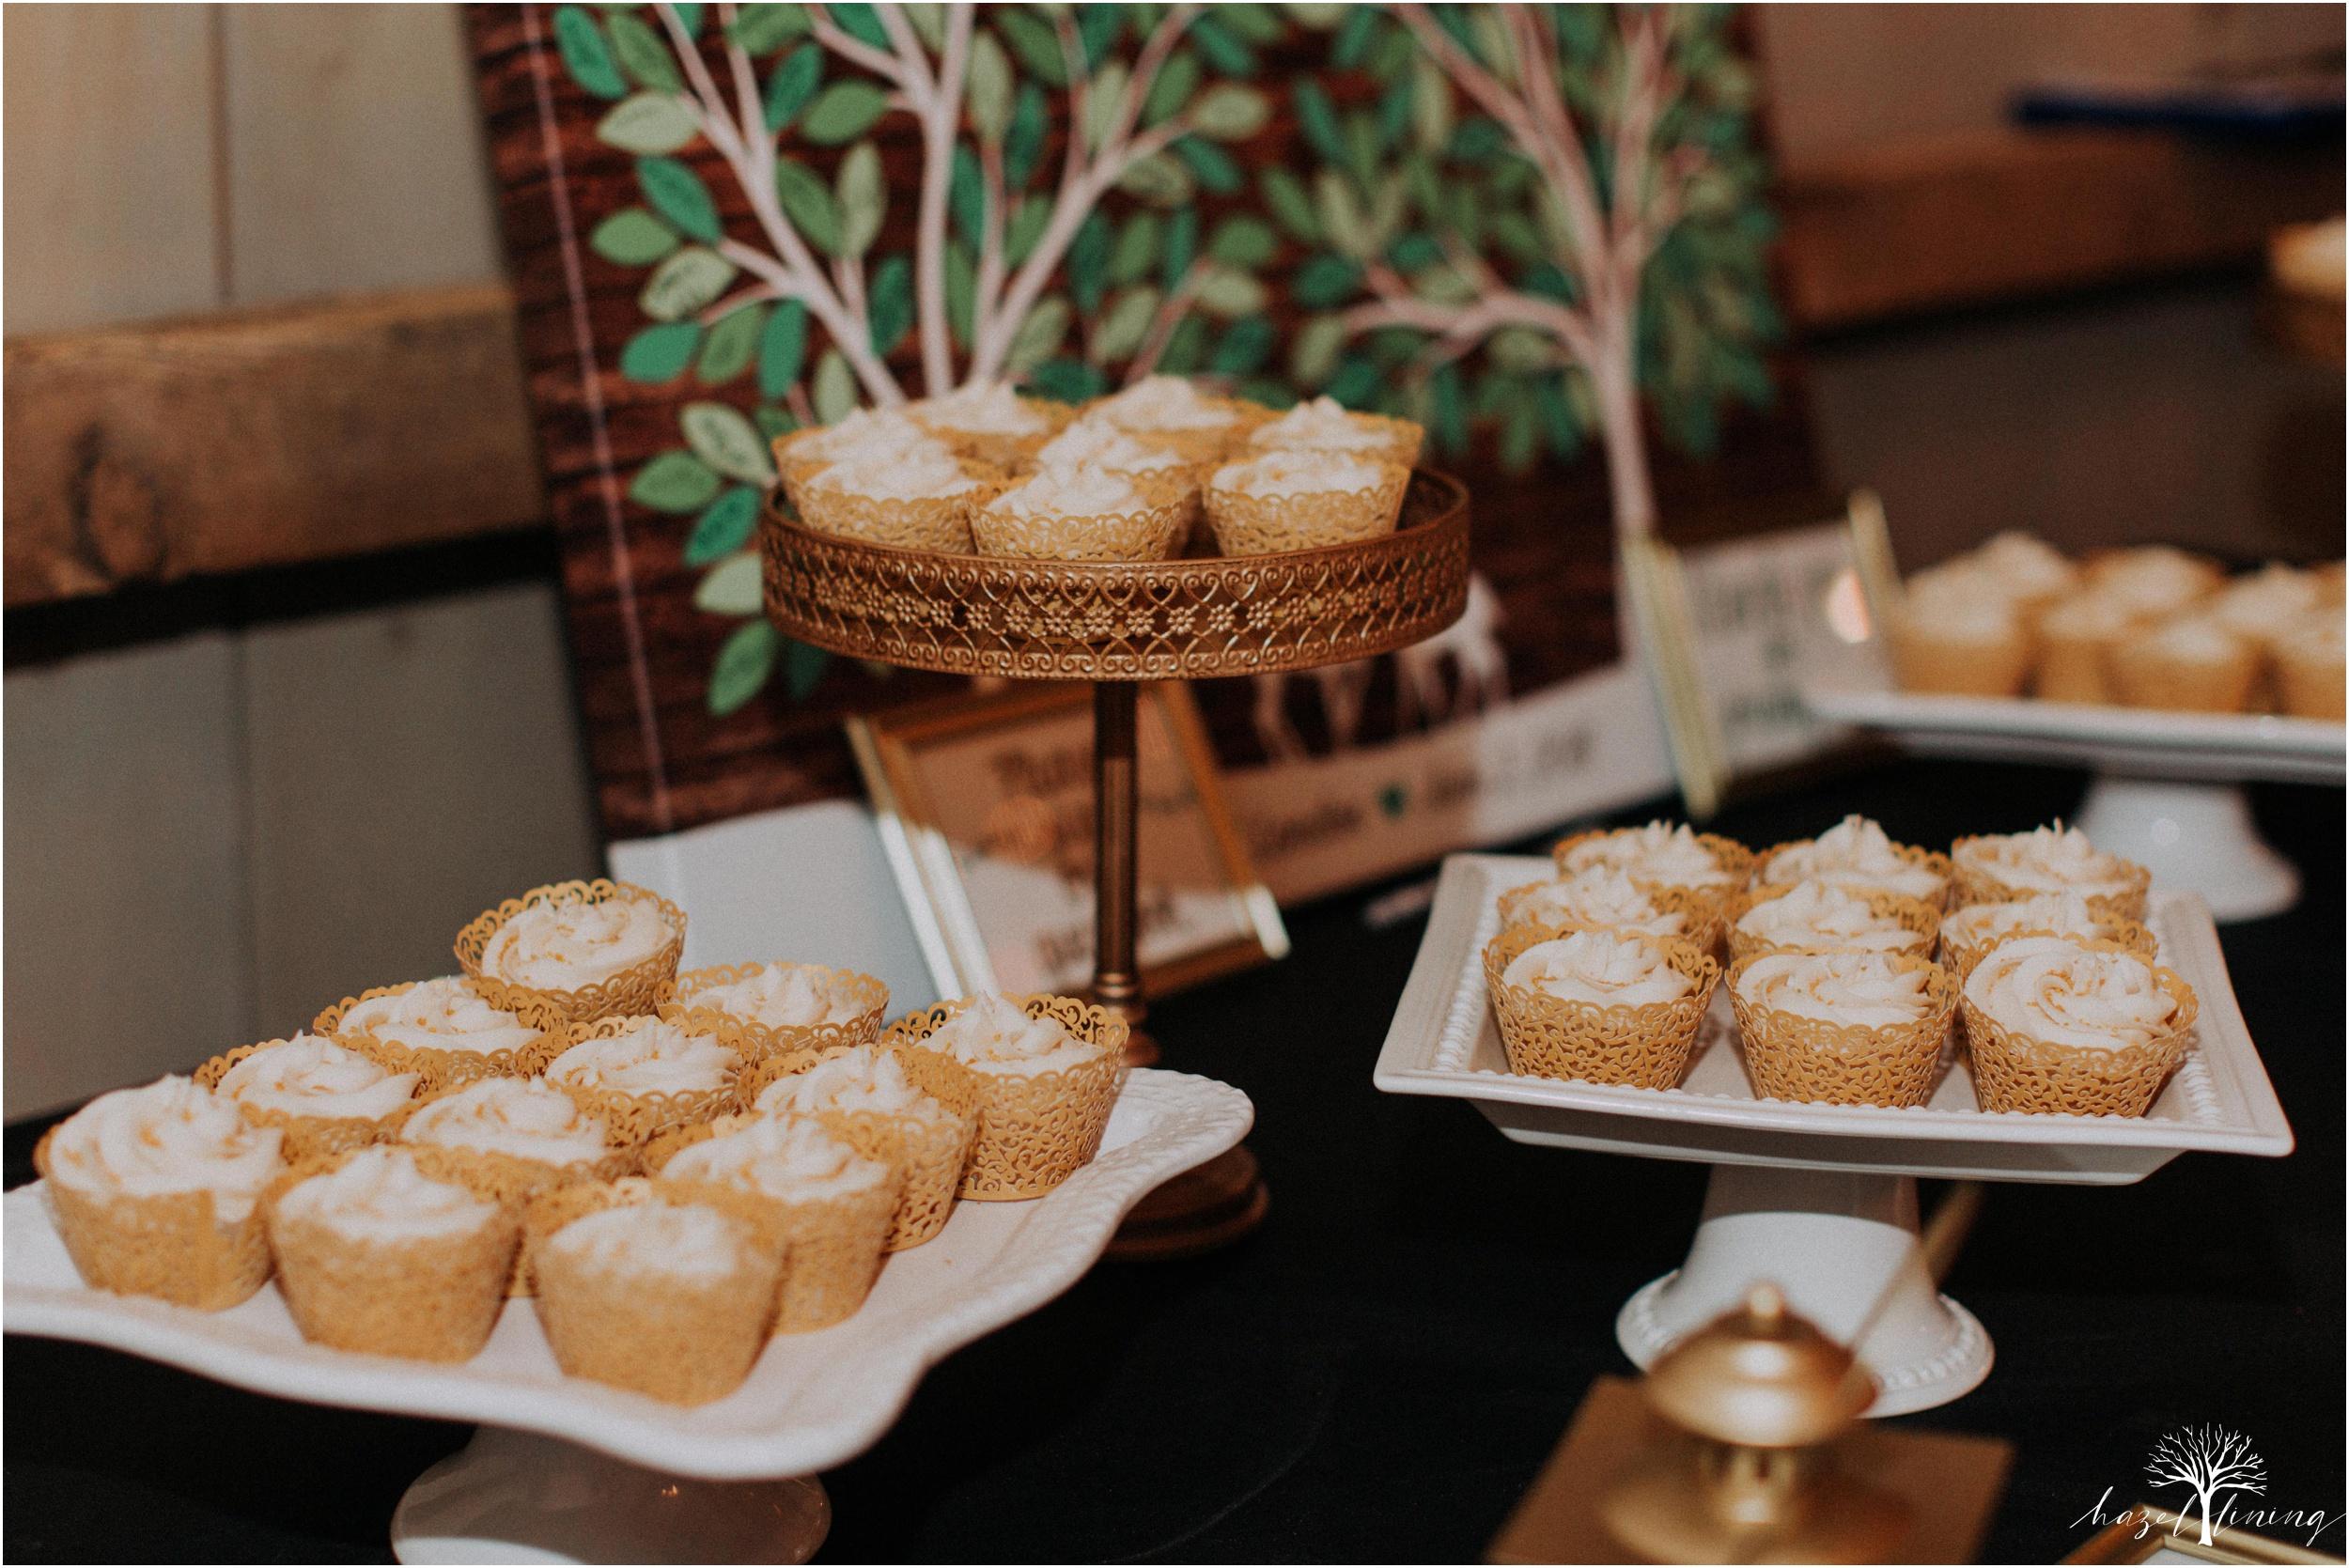 hazel-lining-travel-wedding-elopement-photography-lisa-landon-shoemaker-the-farm-bakery-and-events-bucks-county-quakertown-pennsylvania-summer-country-outdoor-farm-wedding_0137.jpg